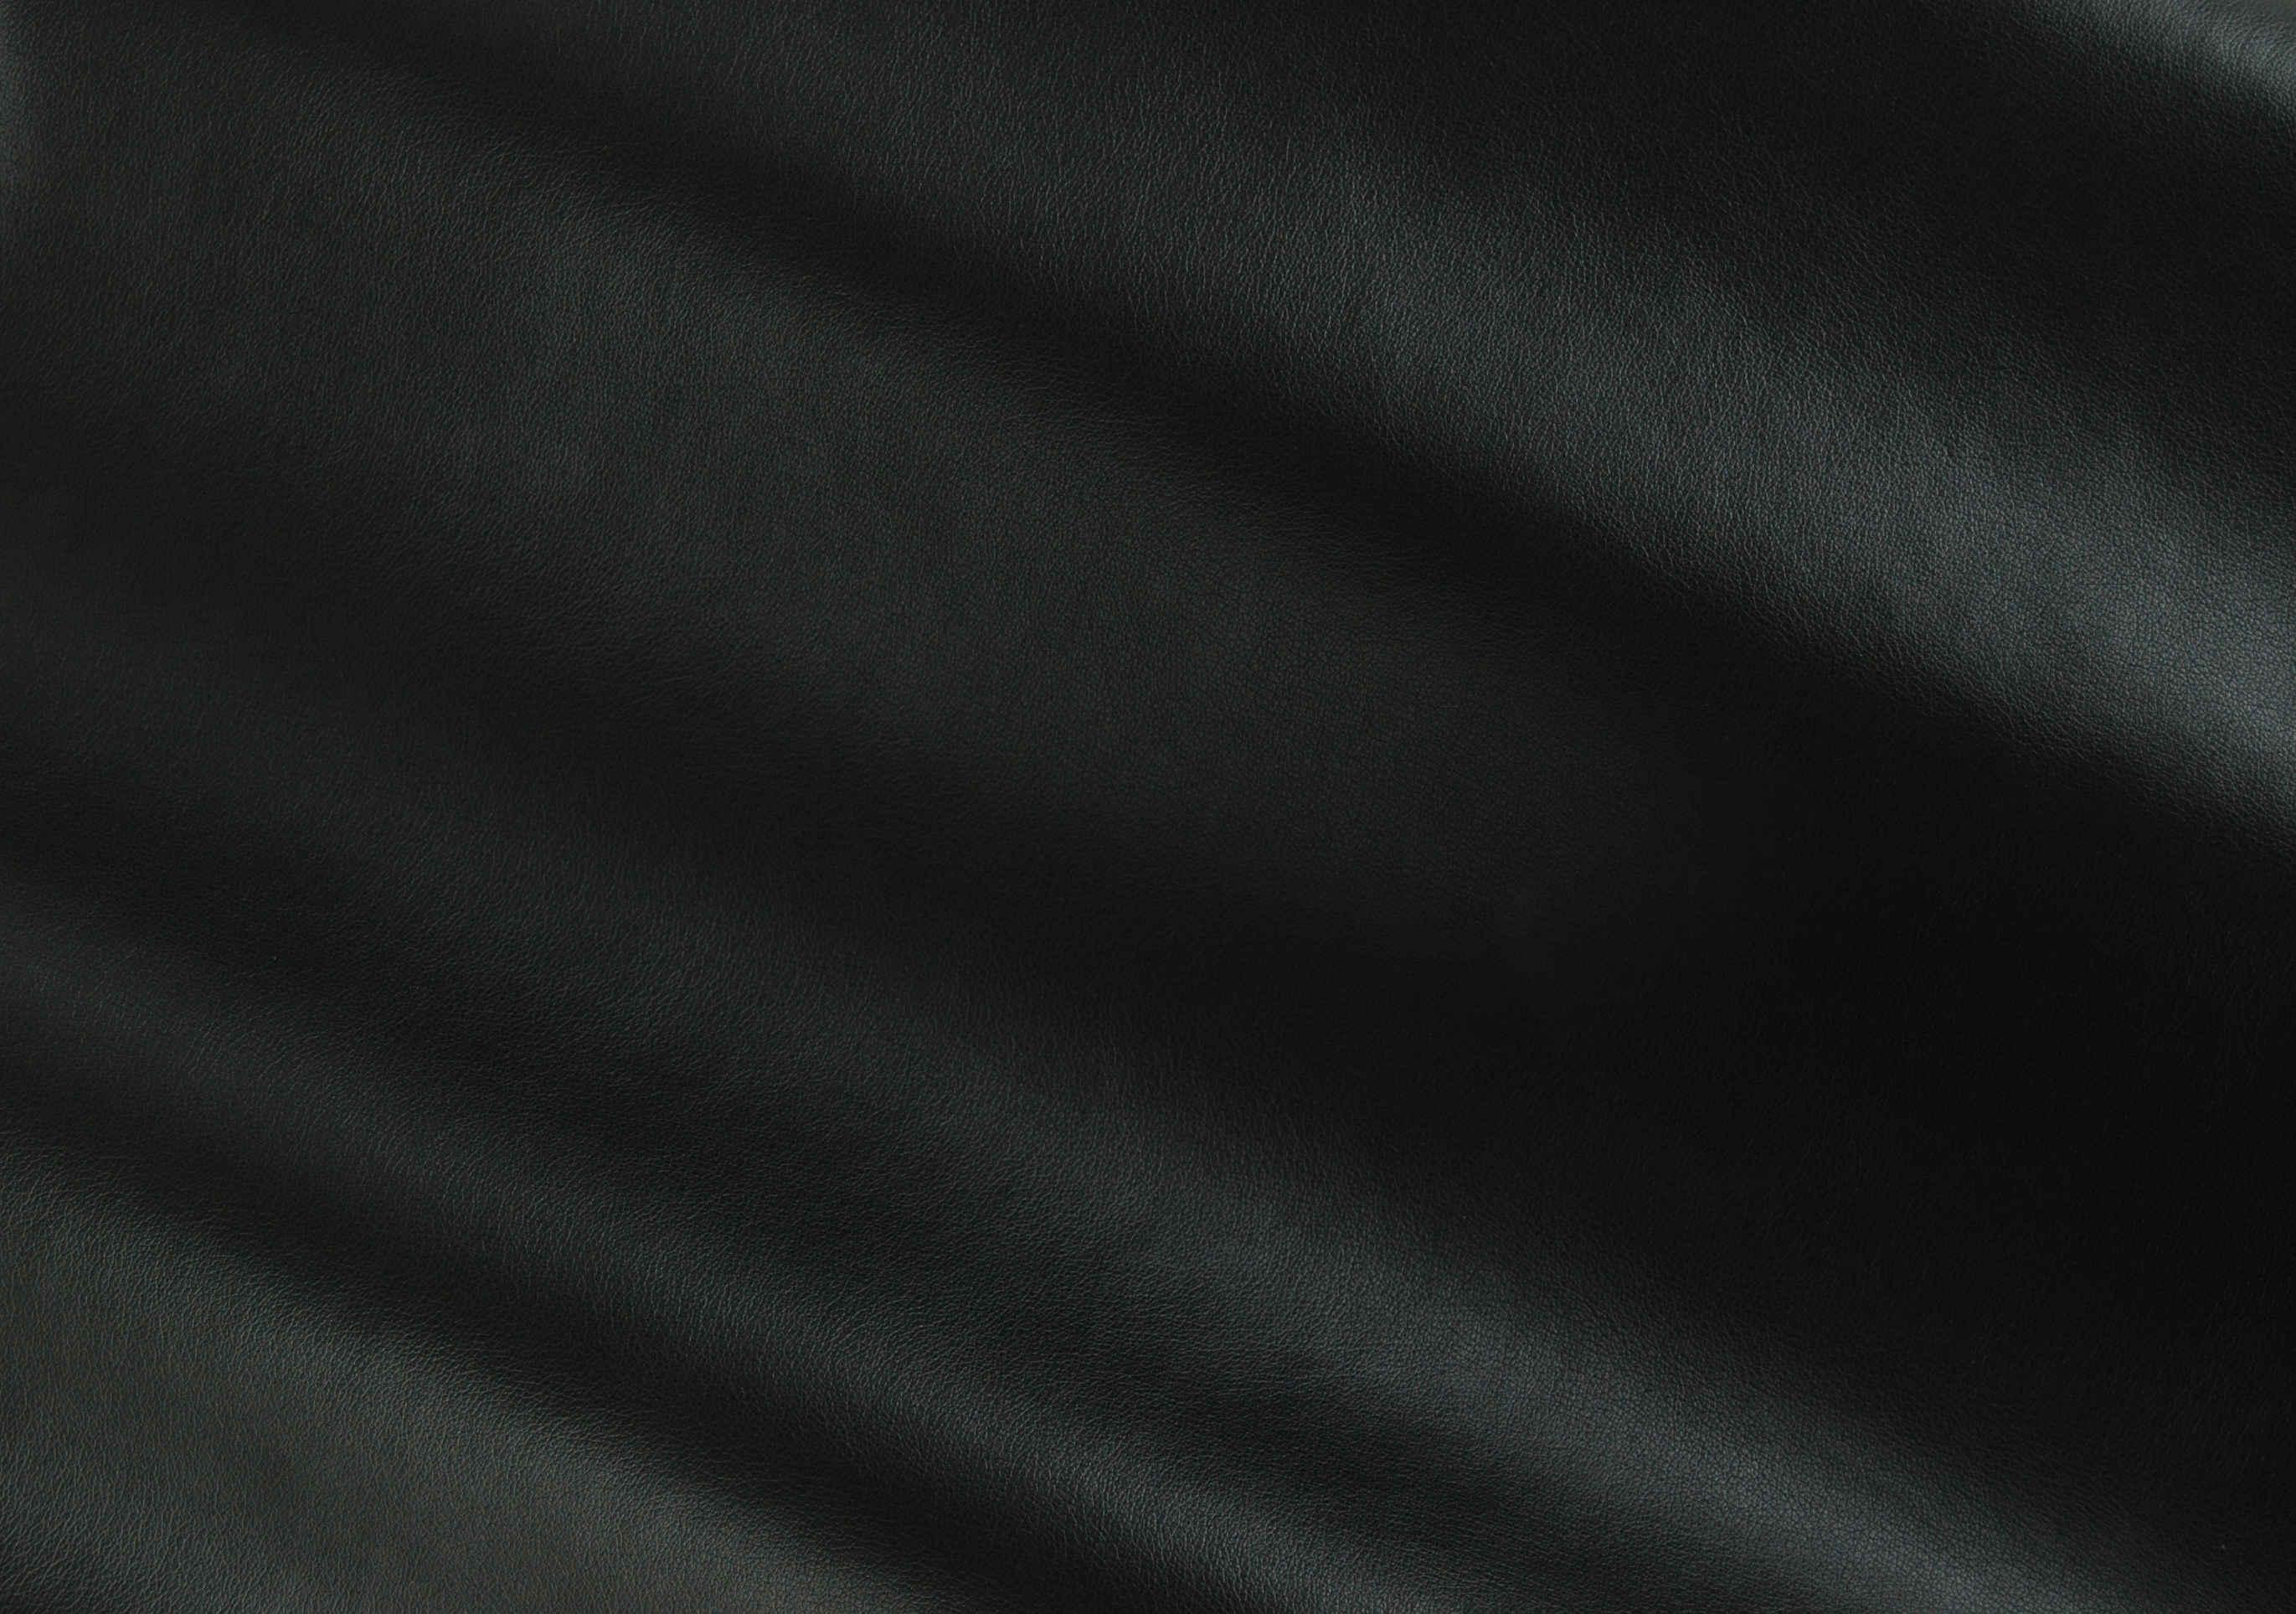 Black Vinyl Fabric Fine Waterproof Leather Match